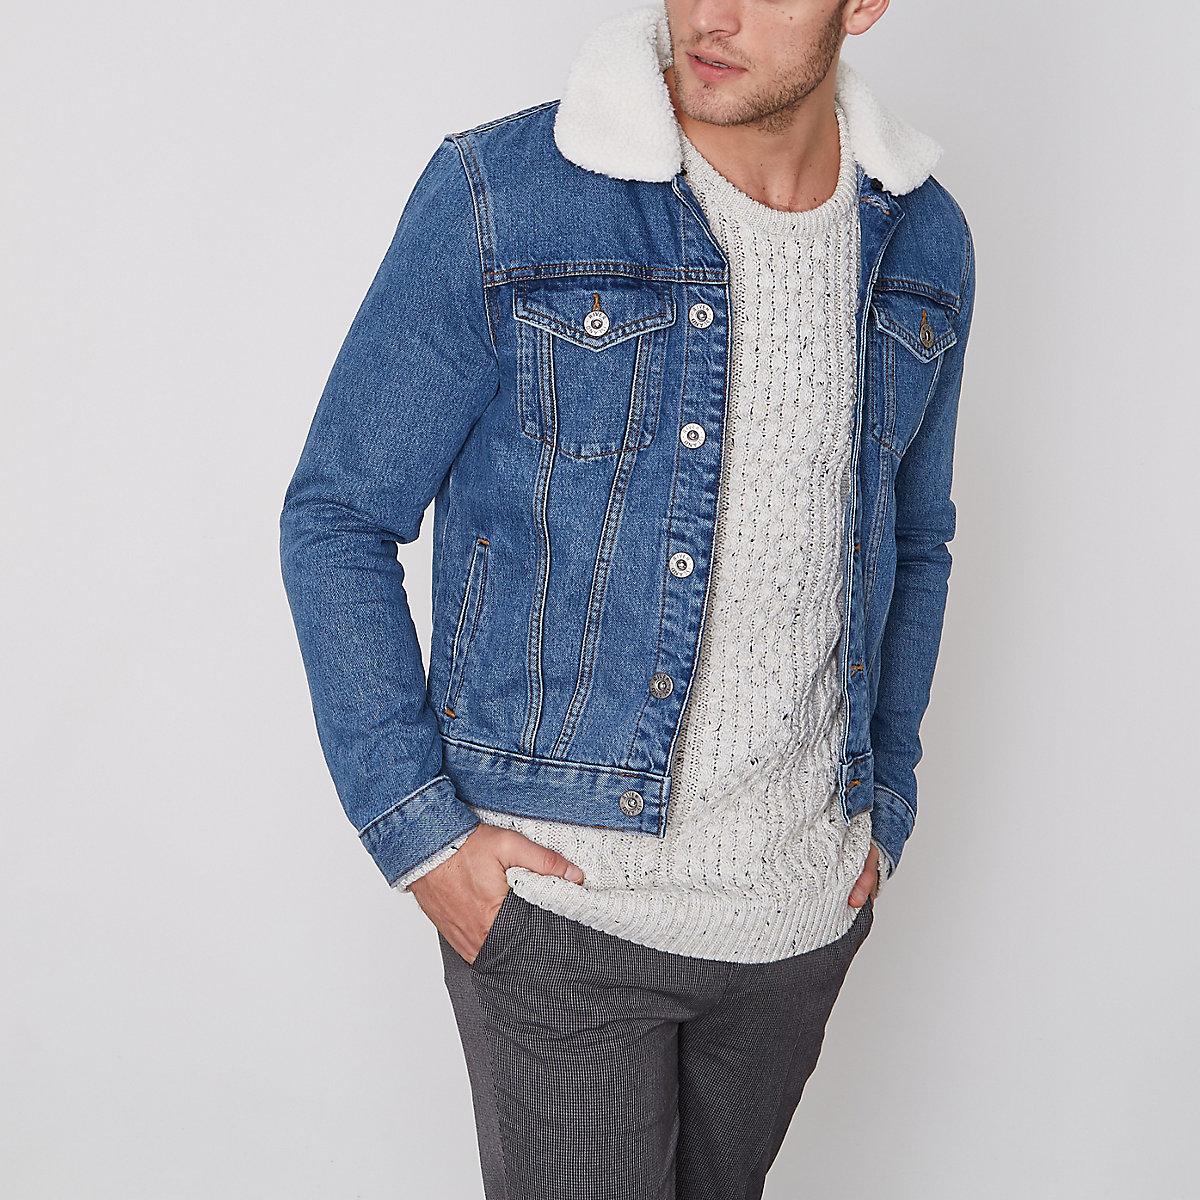 Blue borg lined denim jacket